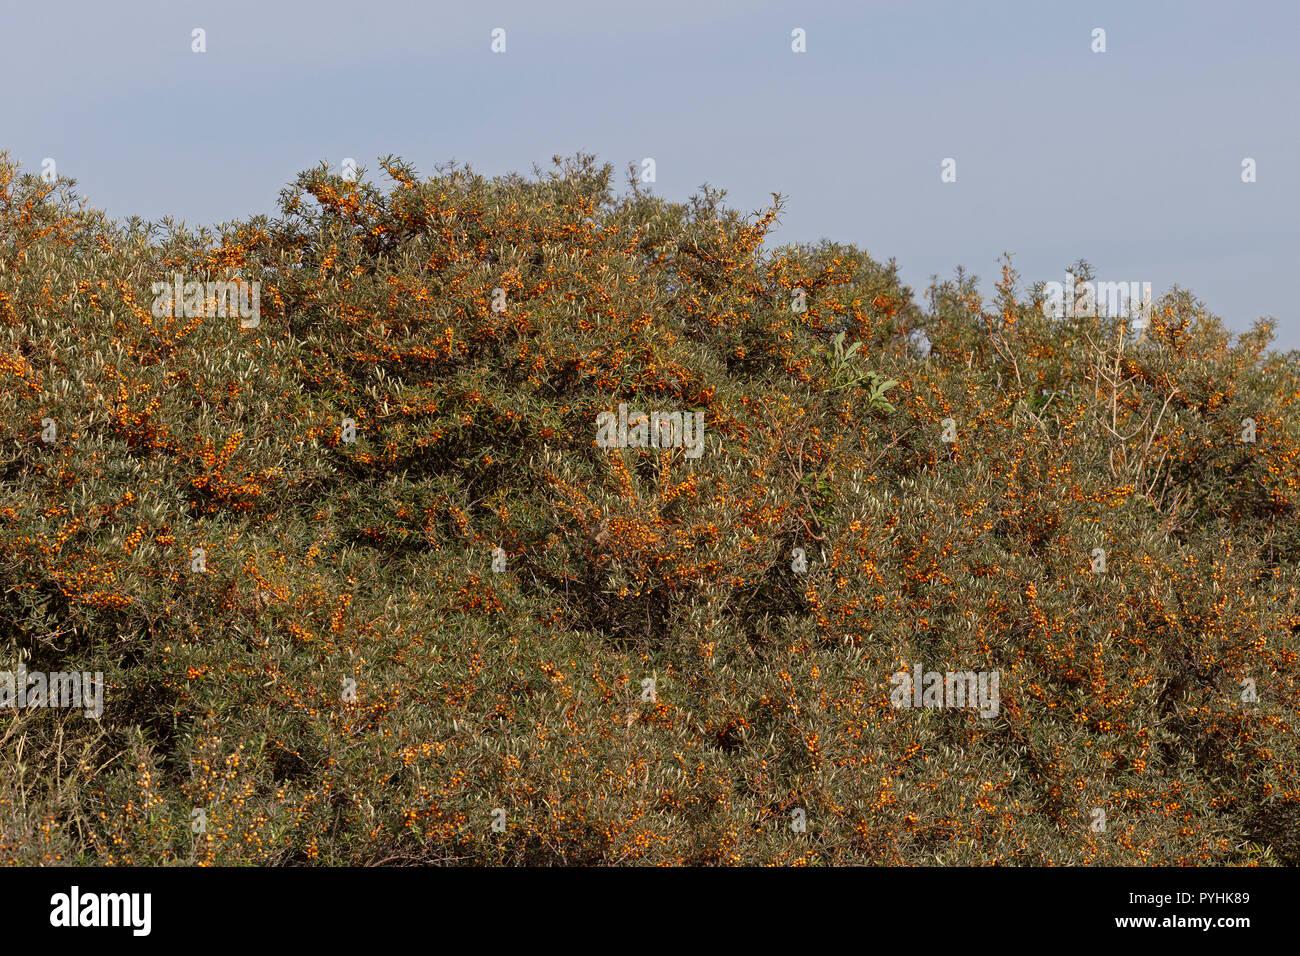 sallow thorn (Hippophae rhamnoides), Duene (Dune), Heligoland, Schleswig-Holstein, Germany - Stock Image